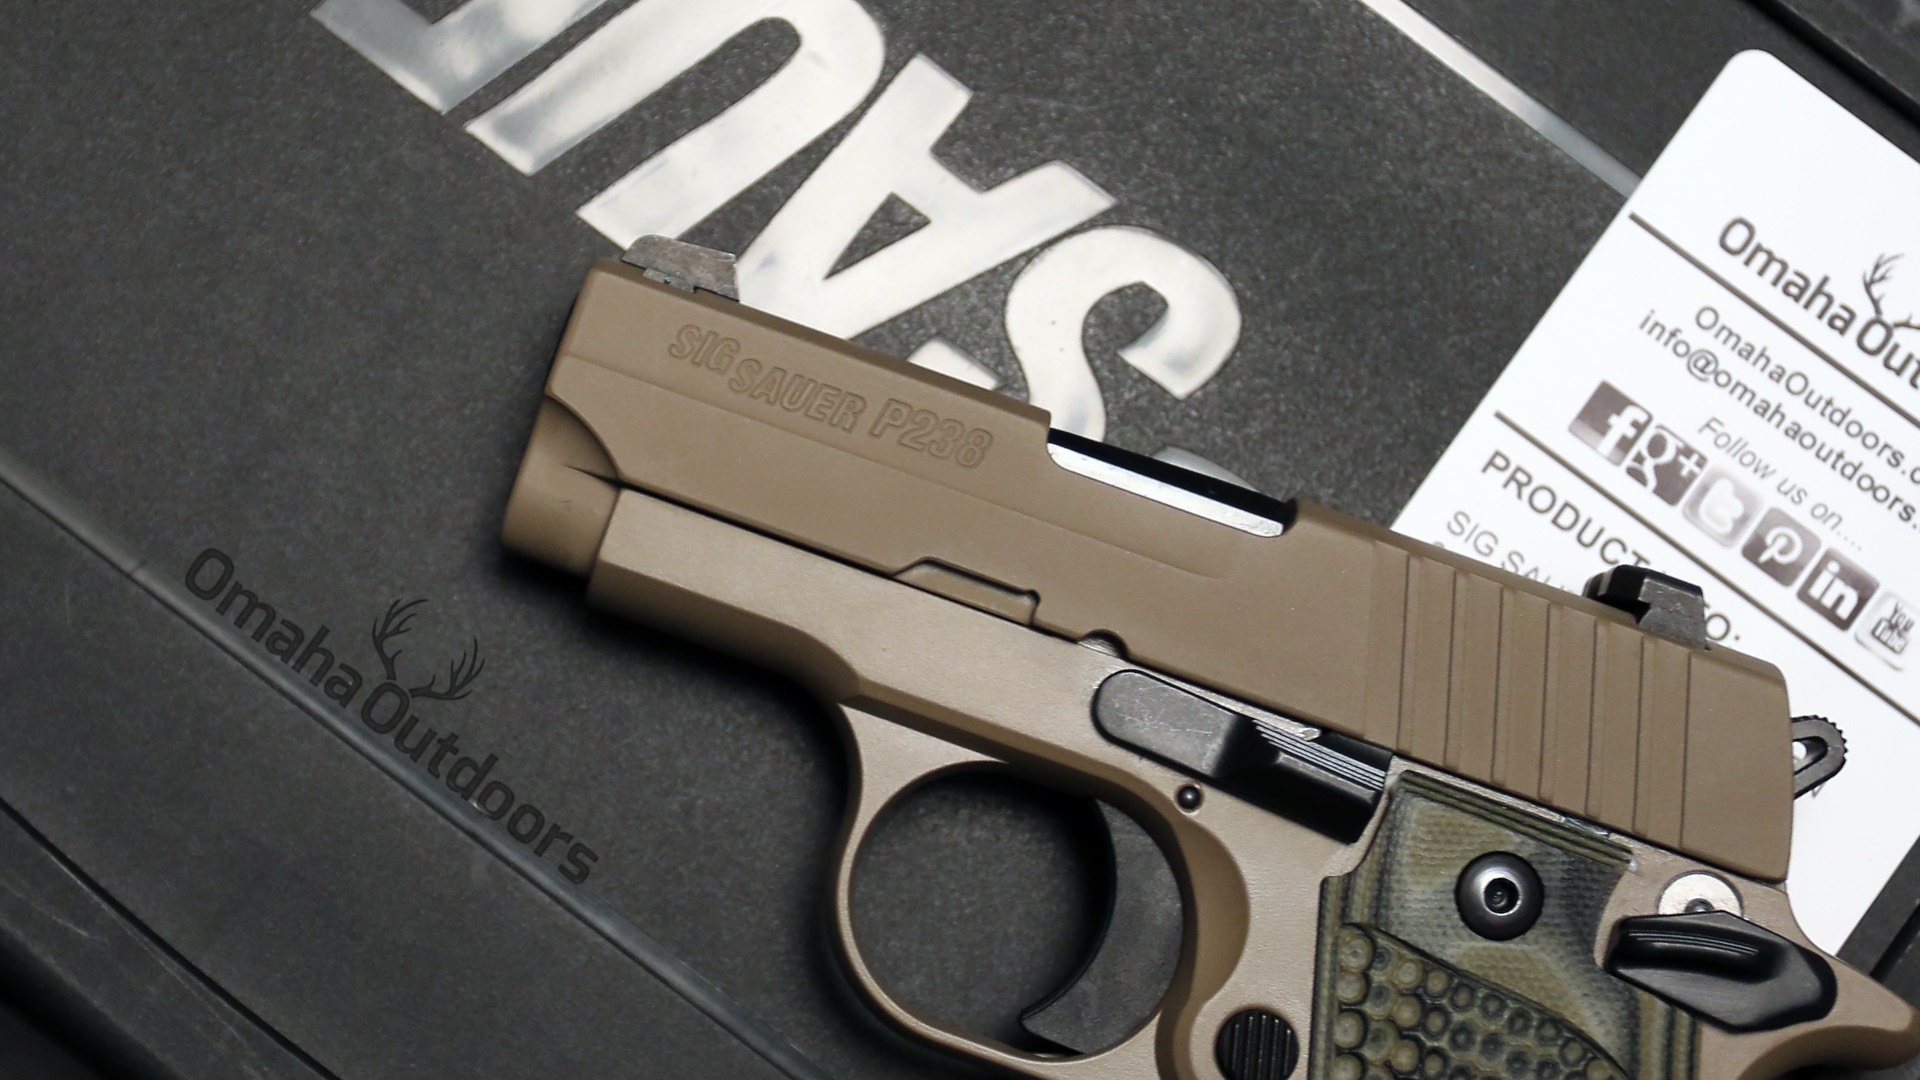 Gun Review: Sig Sauer P238 Scorpion - A Different Micro